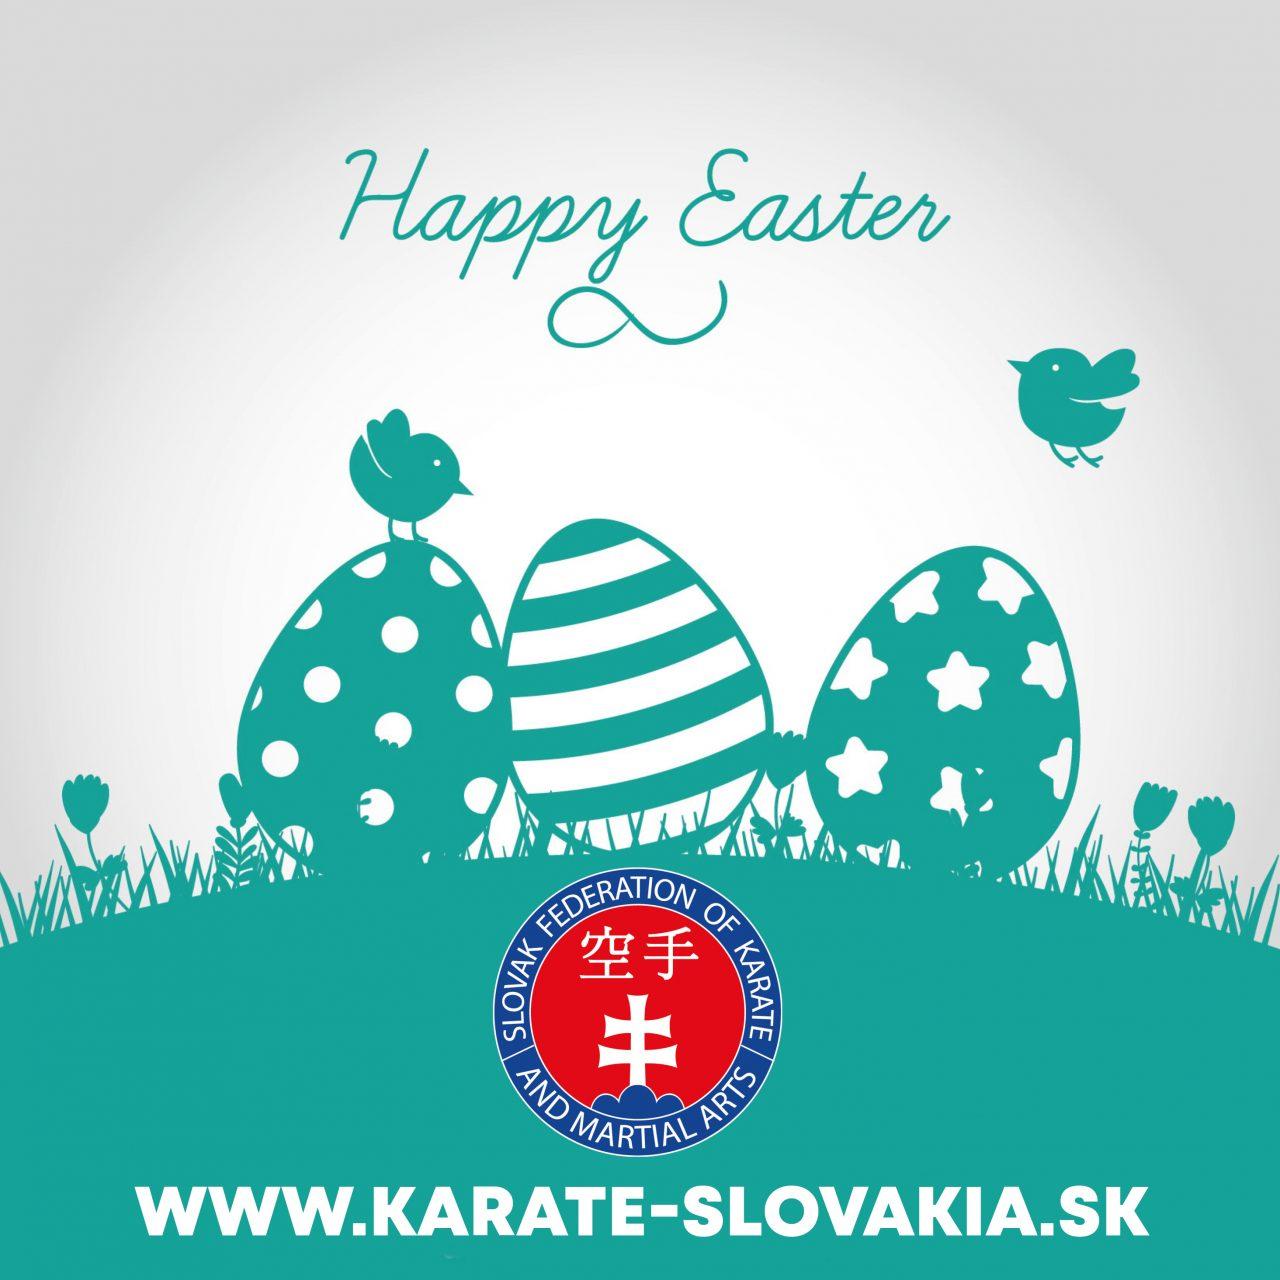 https://karate-slovakia.sk/wp-content/uploads/Velka_noc_SFK-1280x1280.jpg